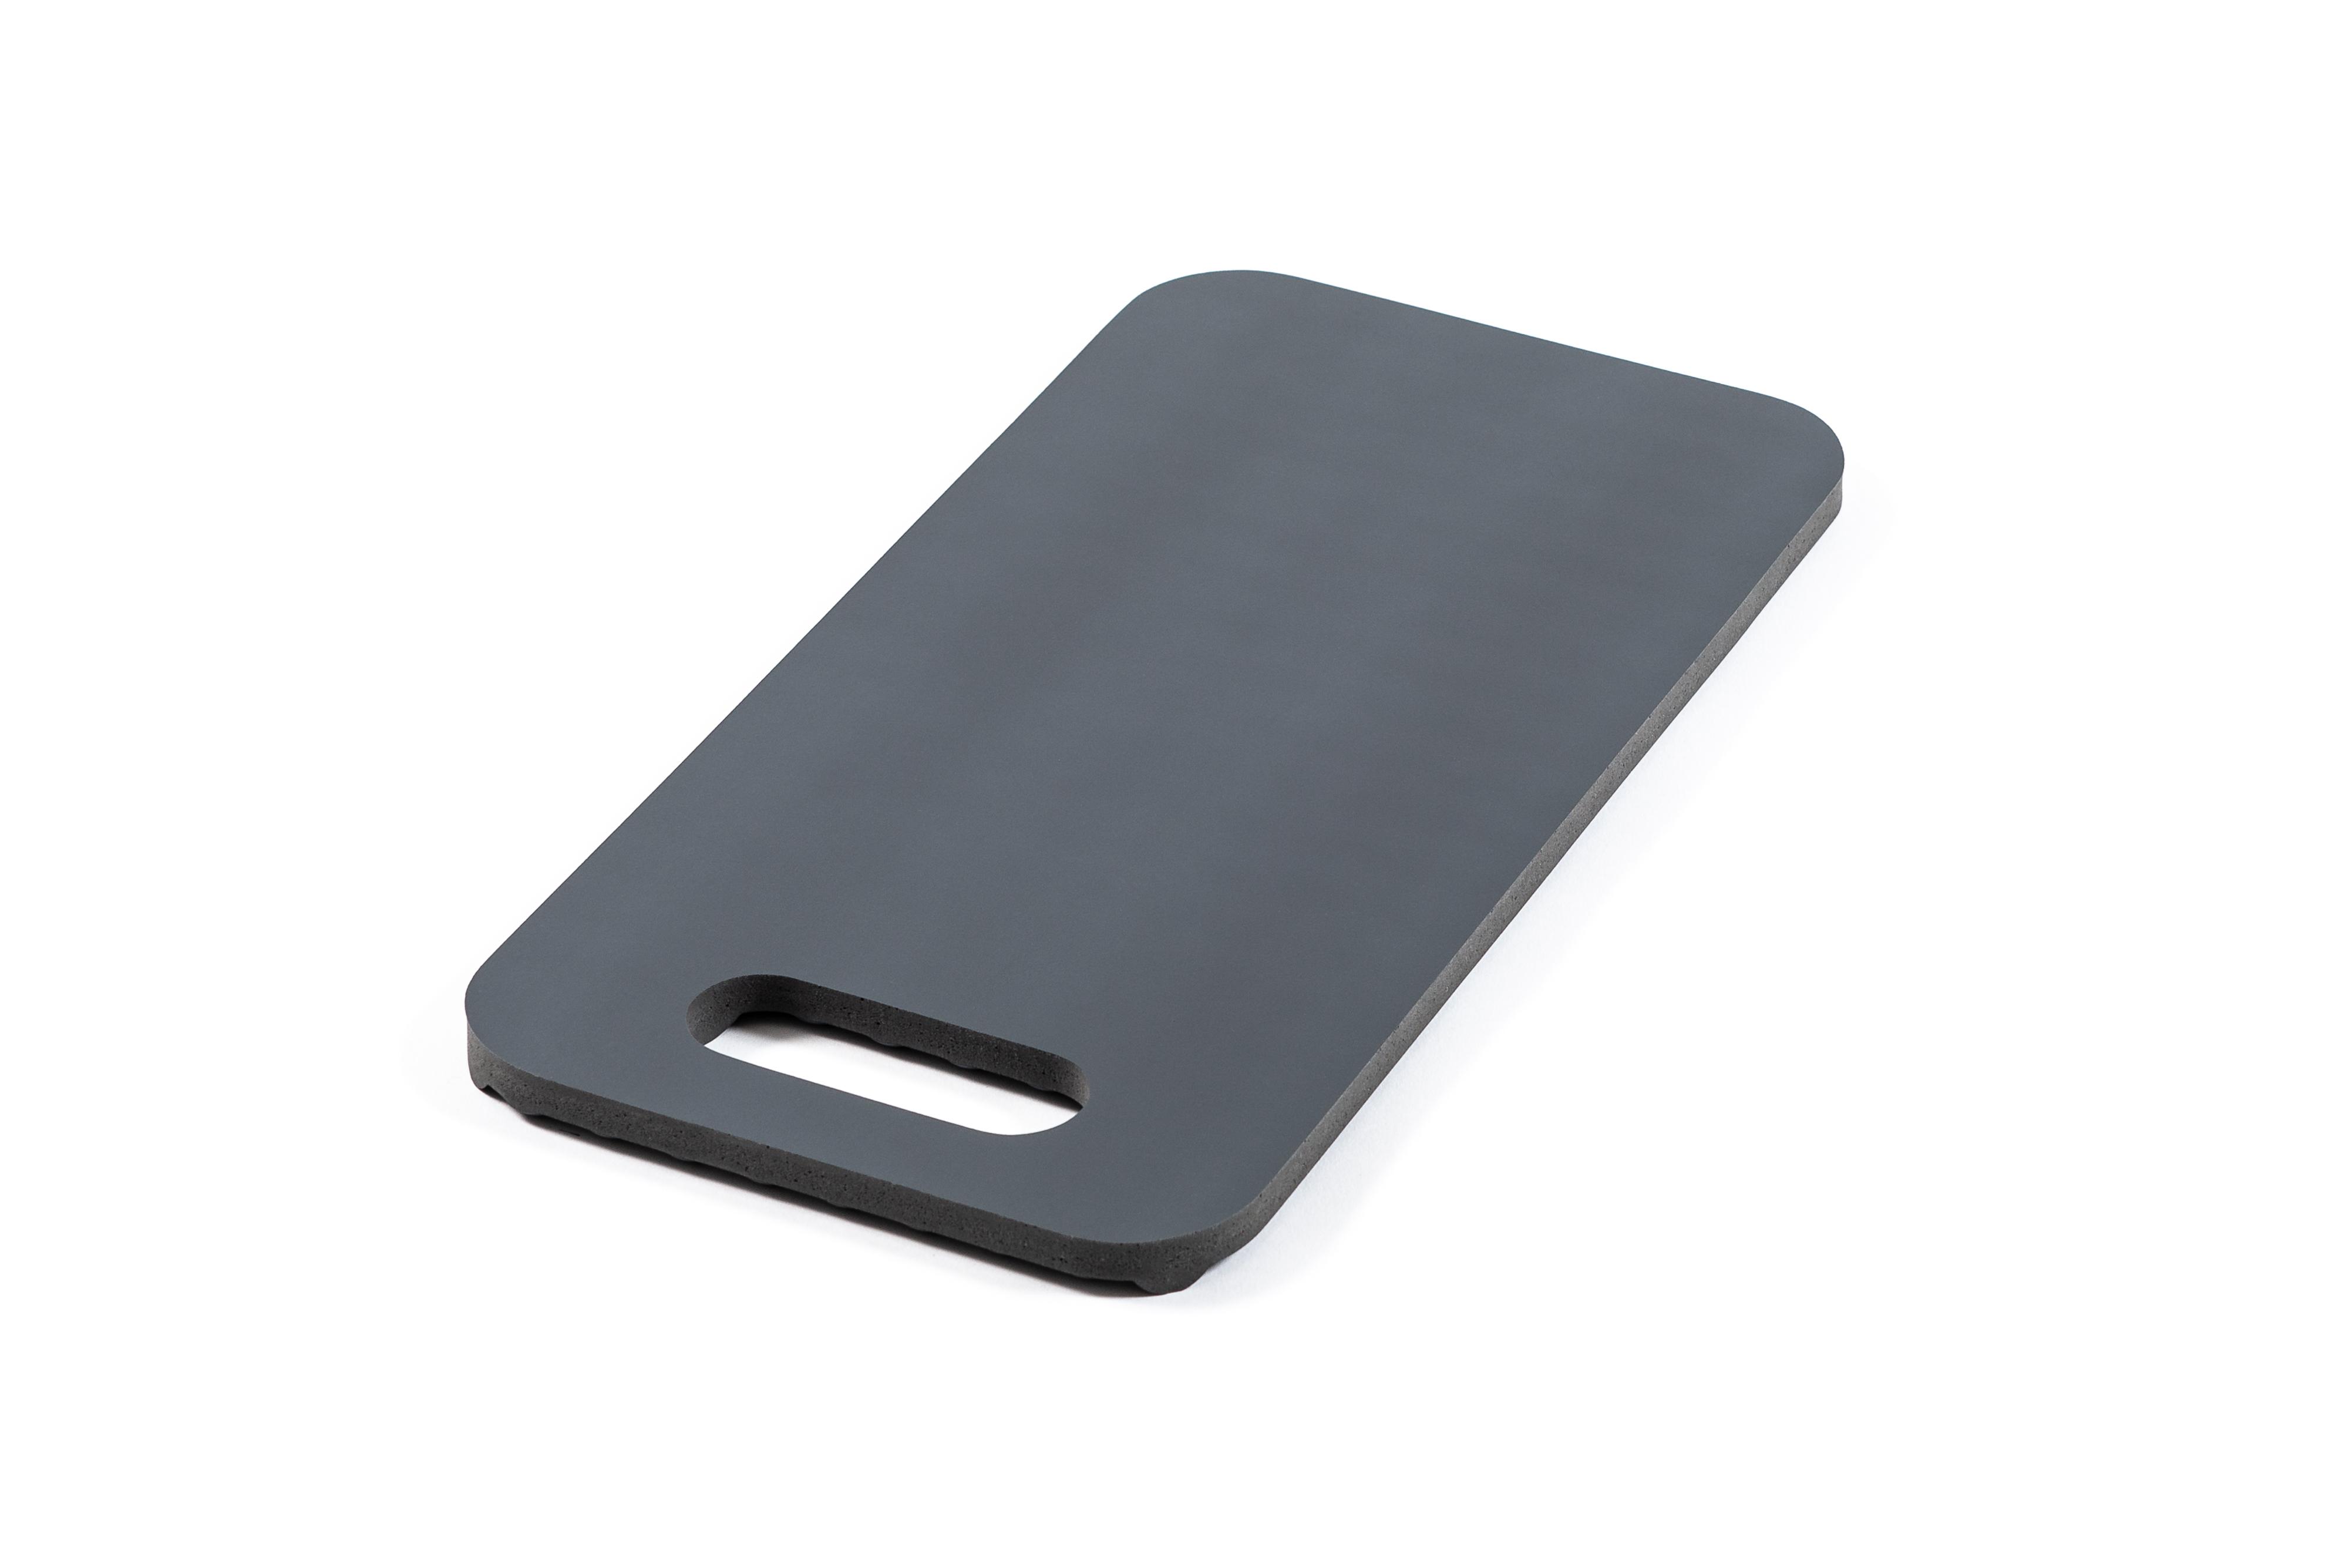 Pur-pad kneepad ergonomic